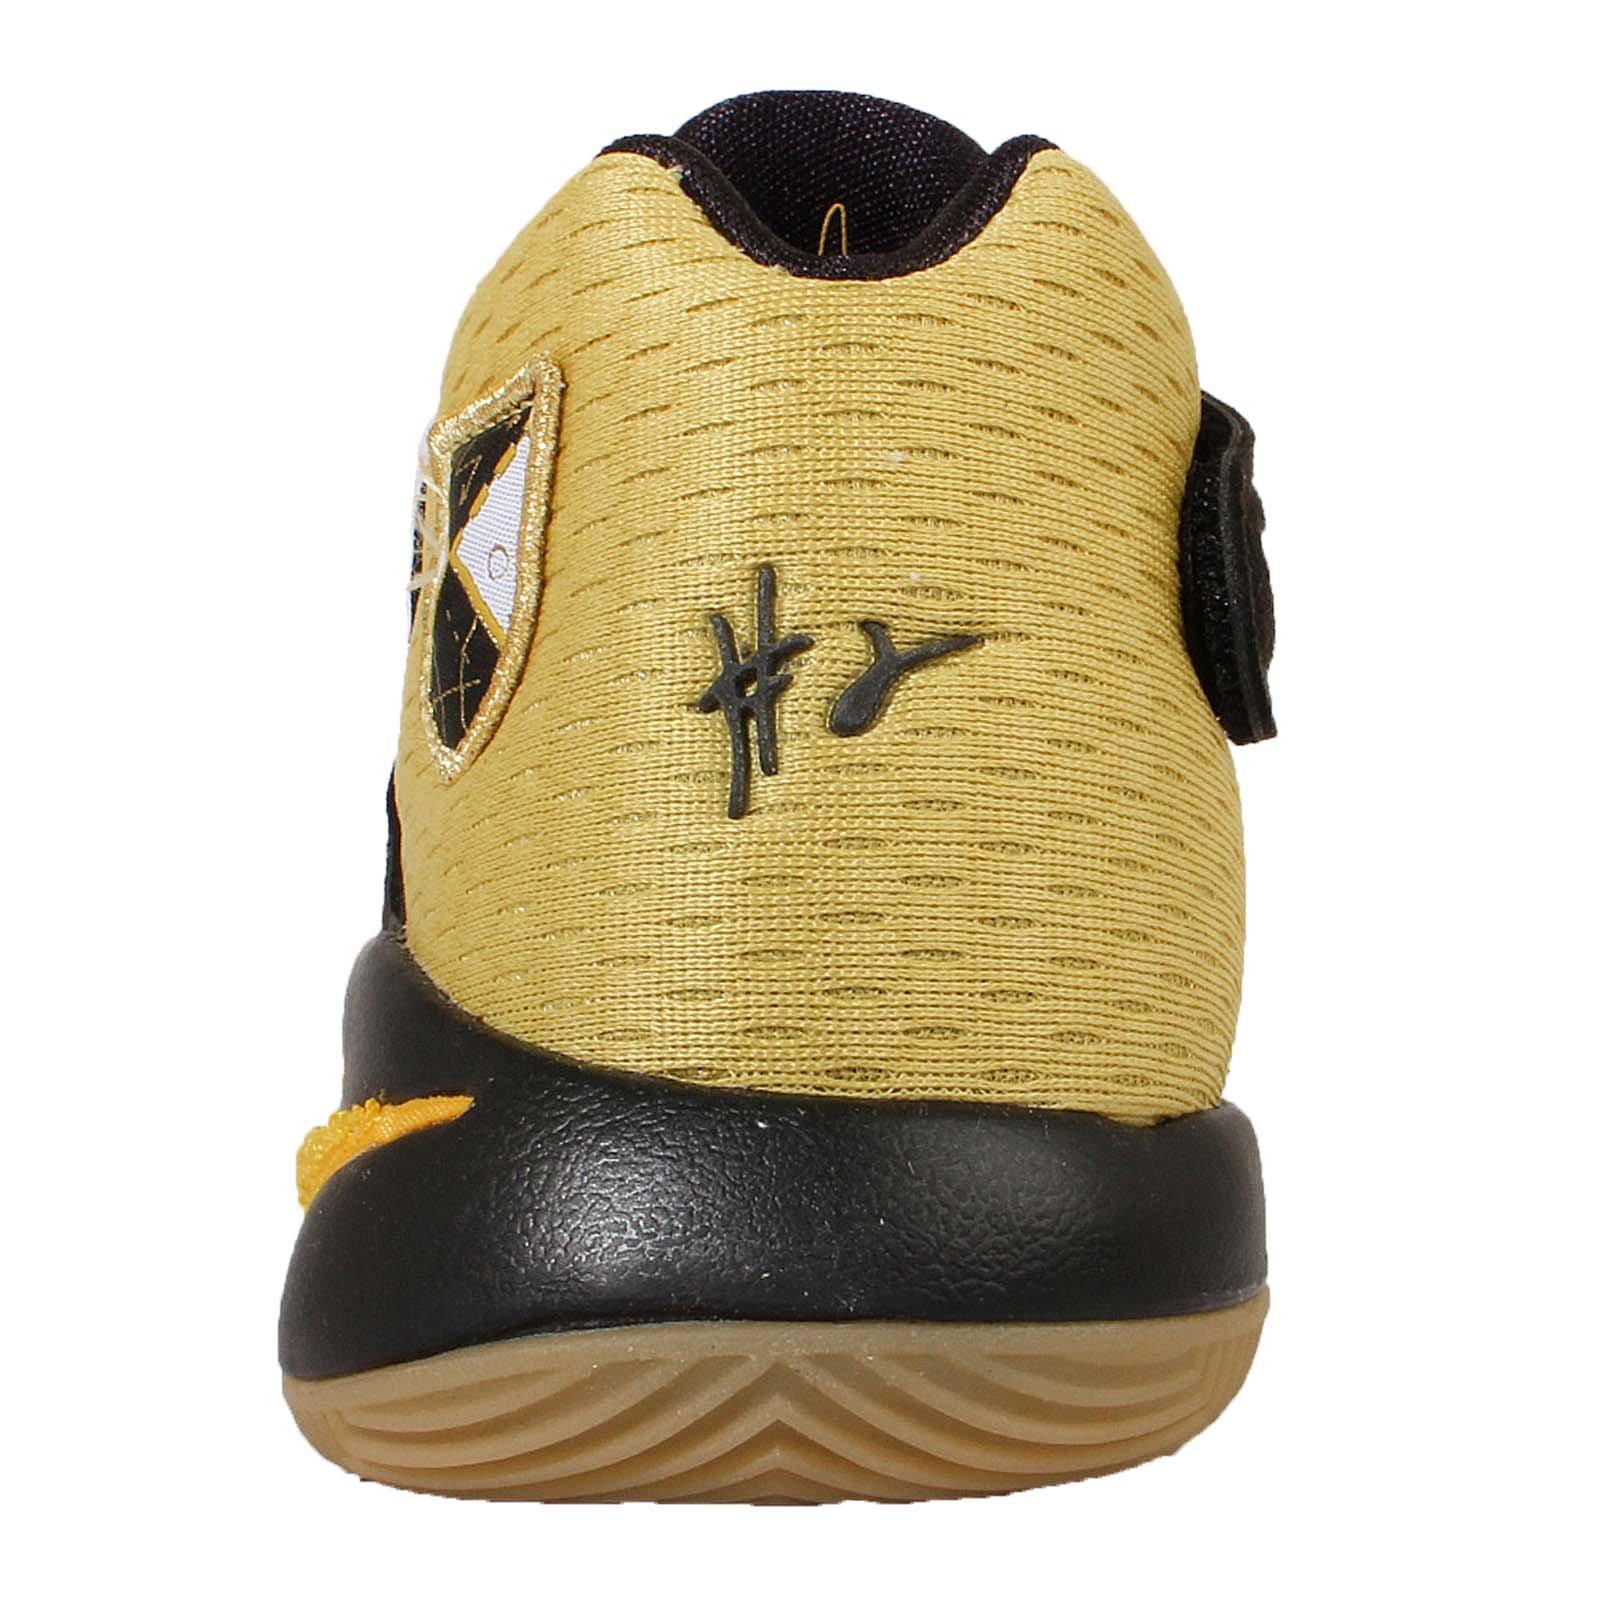 Nike Kids Kyrie 2 AS GS, ALL STAR-CELERY/VARSITY MAIZE-BLACK, Youth Size 6 by Nike (Image #4)